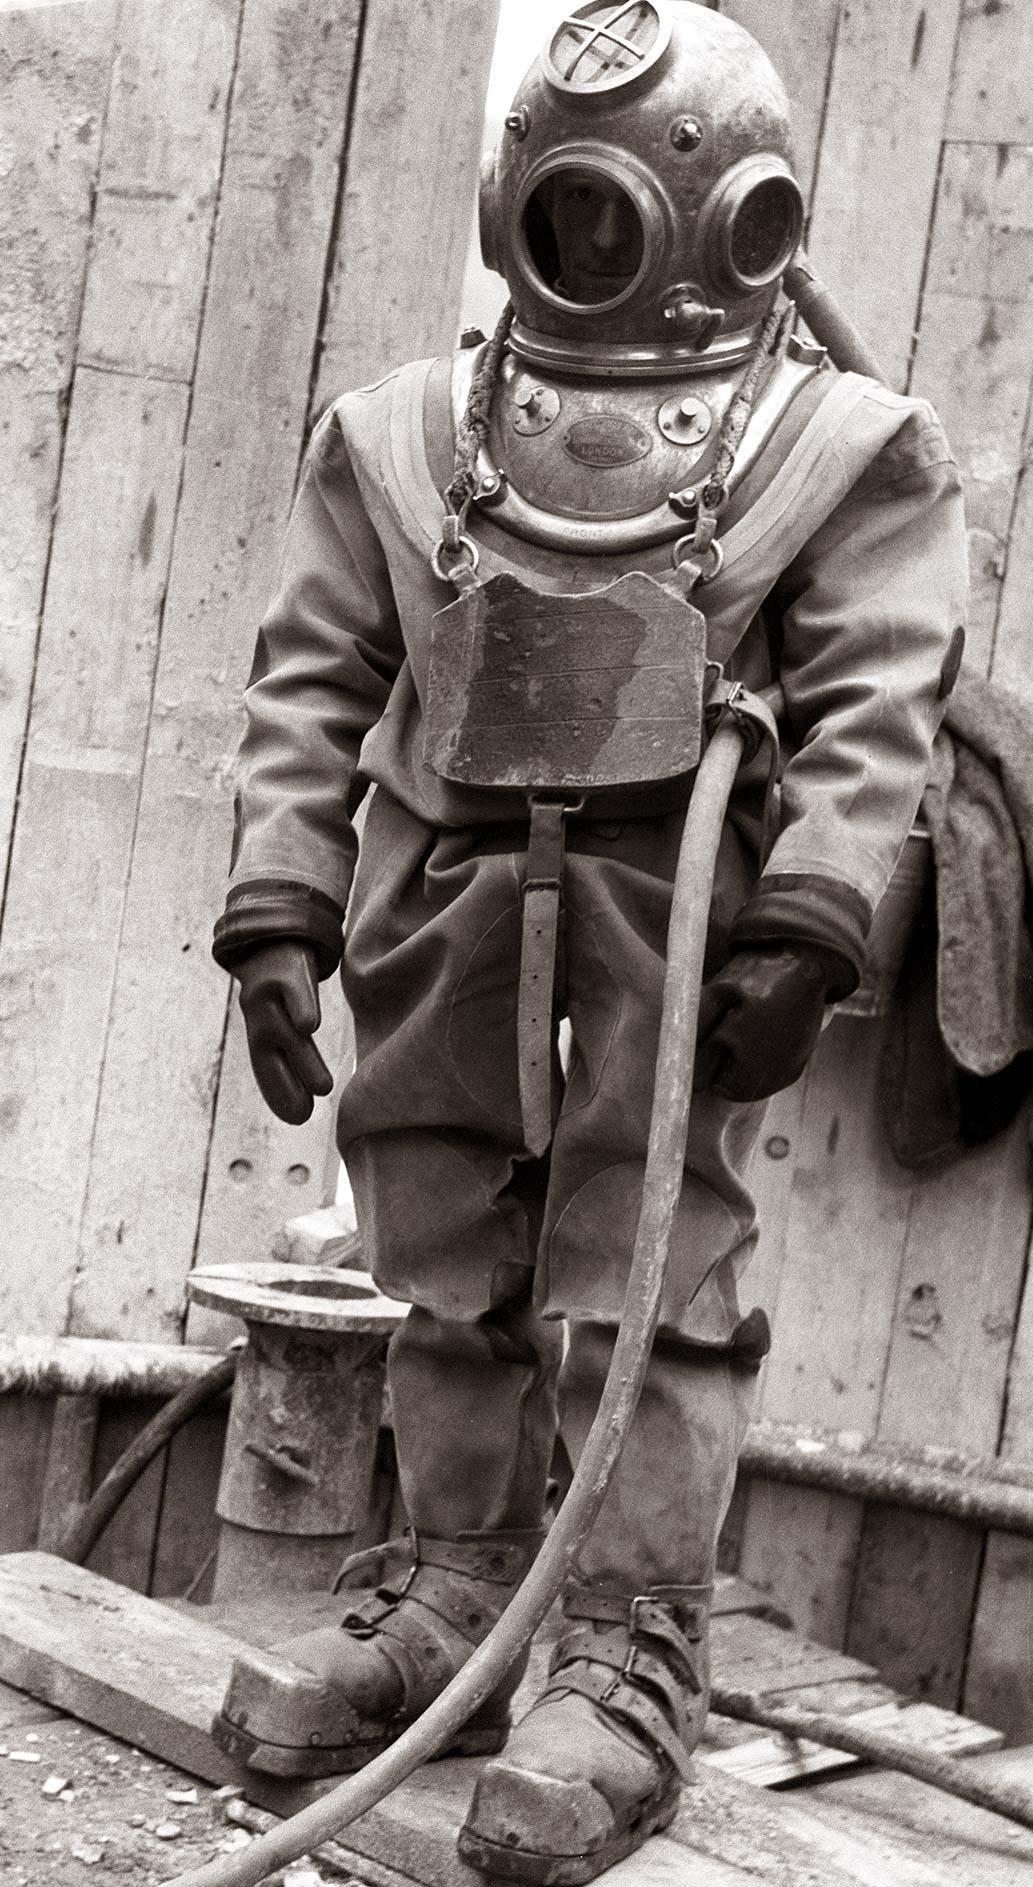 gradbišče_hidroelektrarne_ožbalt_1958,_potapljač